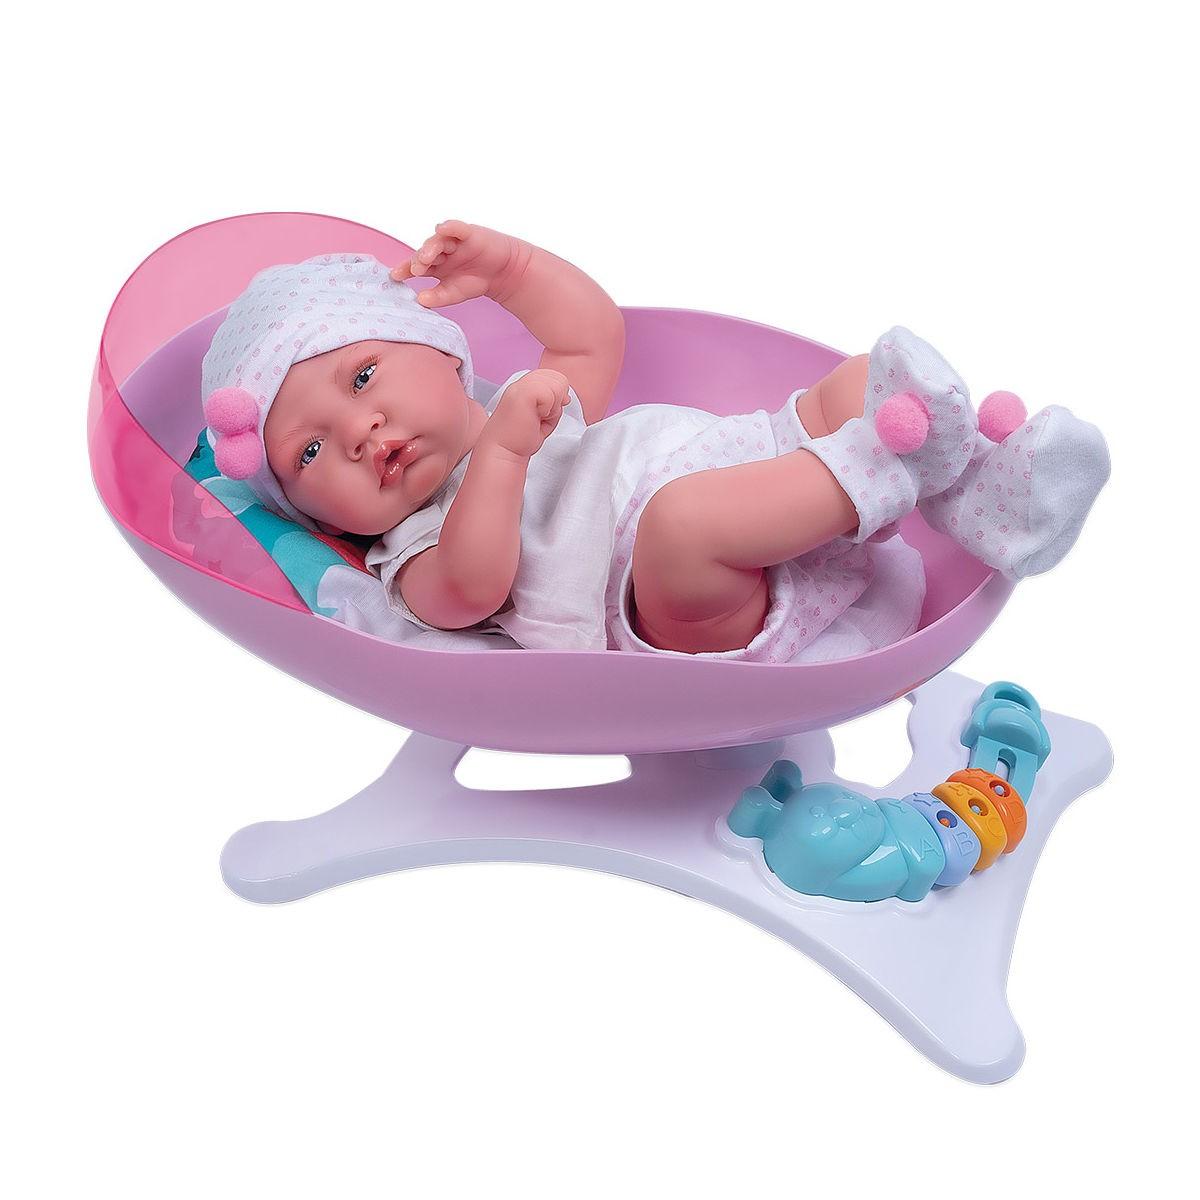 Berço de Balanço Boneca Reborn Baby Ninos Cotiplás